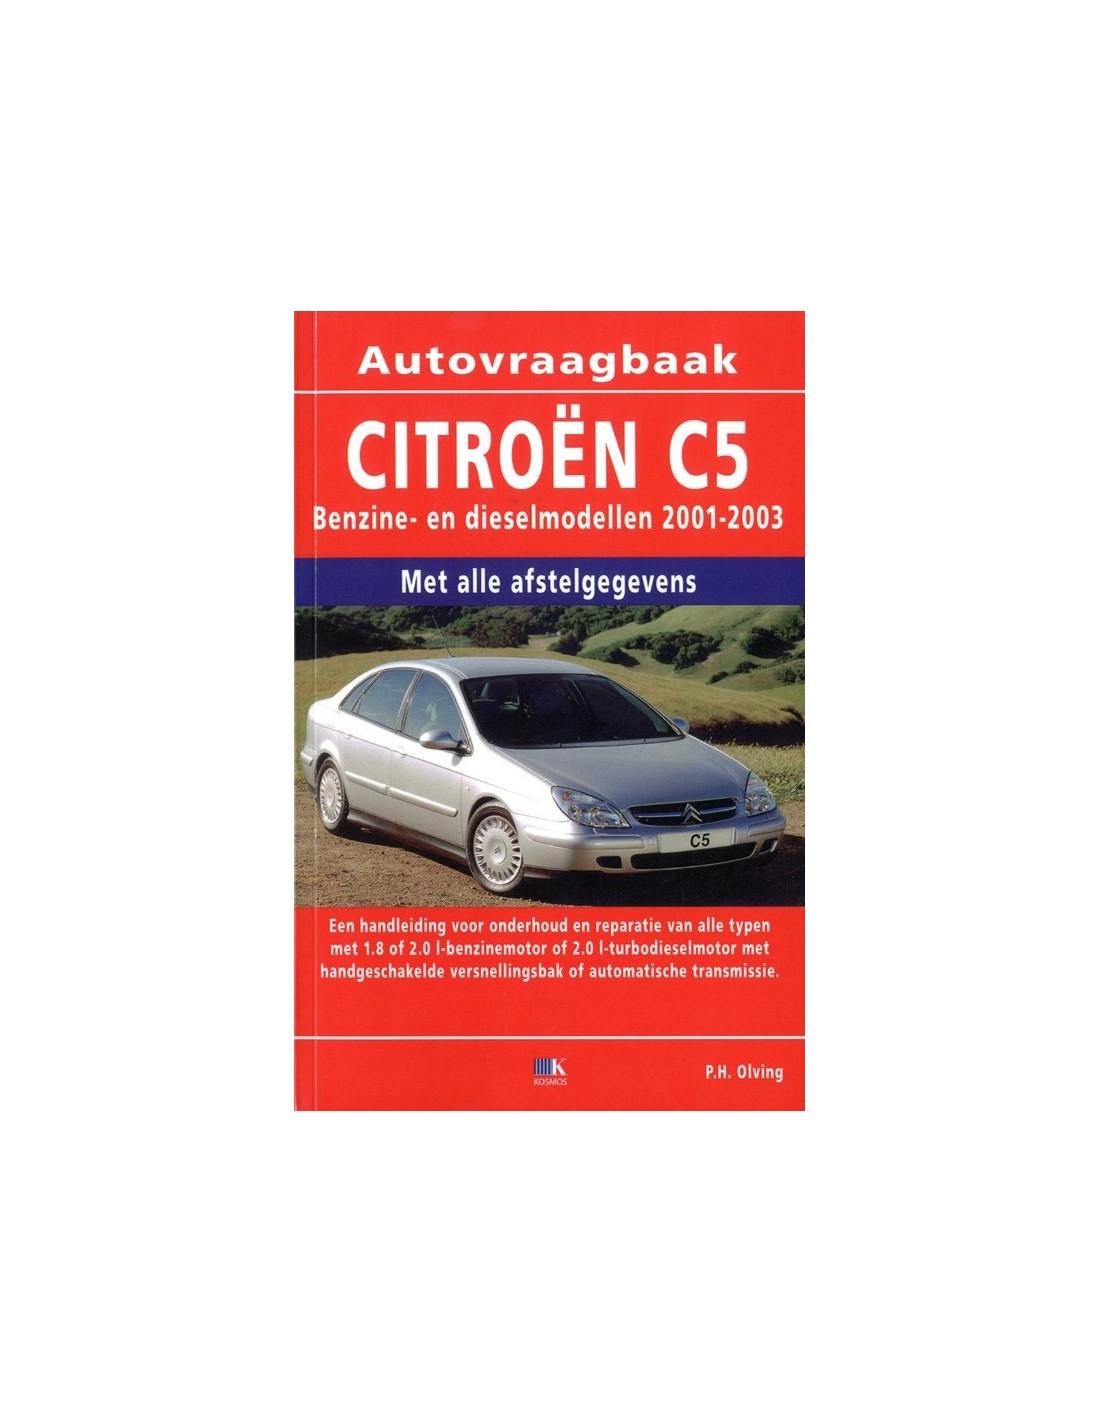 2001 2003 citroen c5 petrol diesel handbook dutch rh autolit eu Citroen C7 Citroen C2